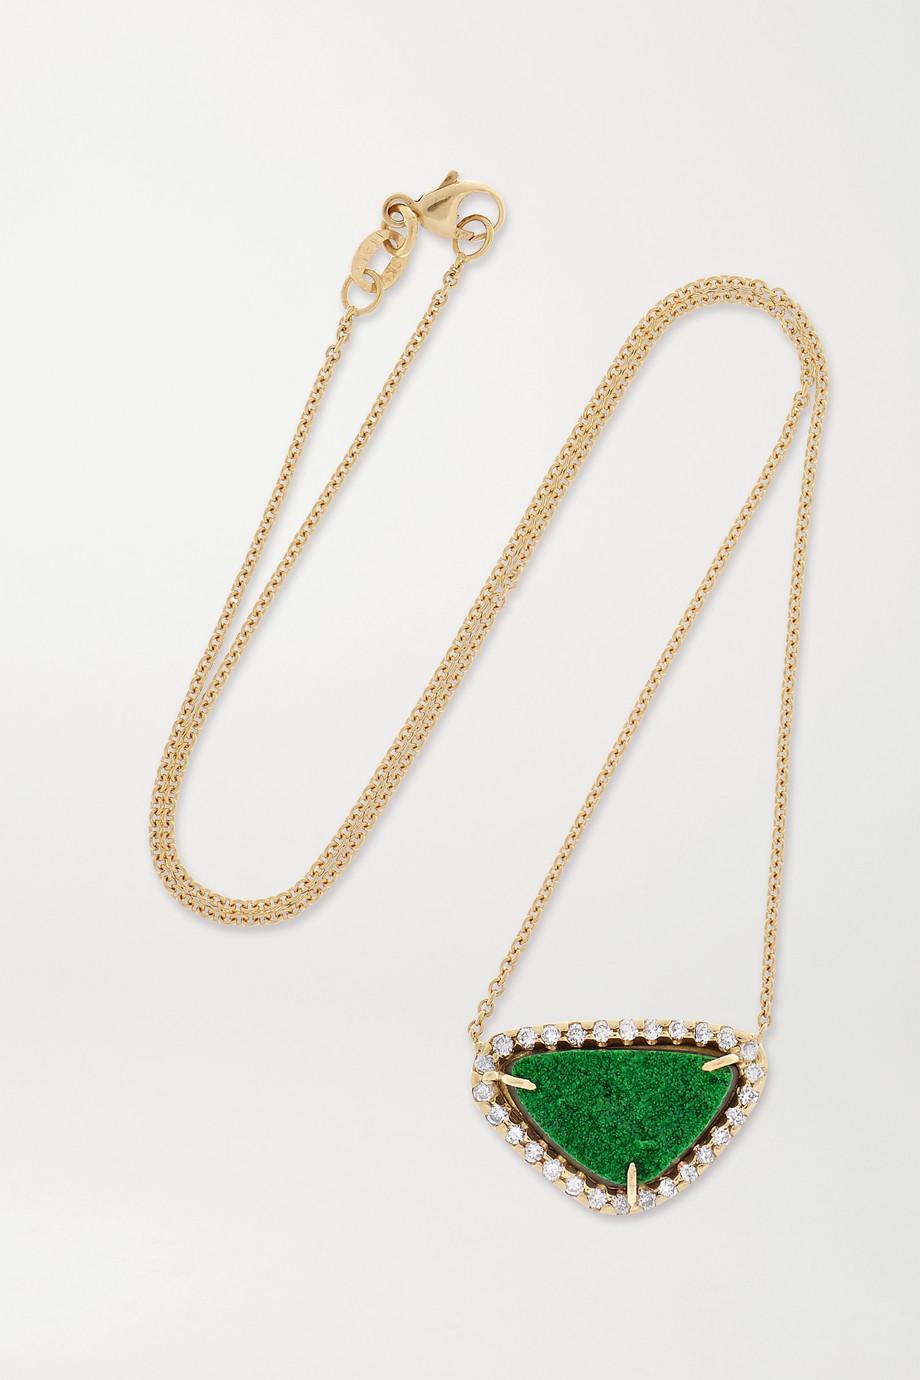 Kimberly McDonald 18-karat gold, uvarovite garnet and diamond necklace